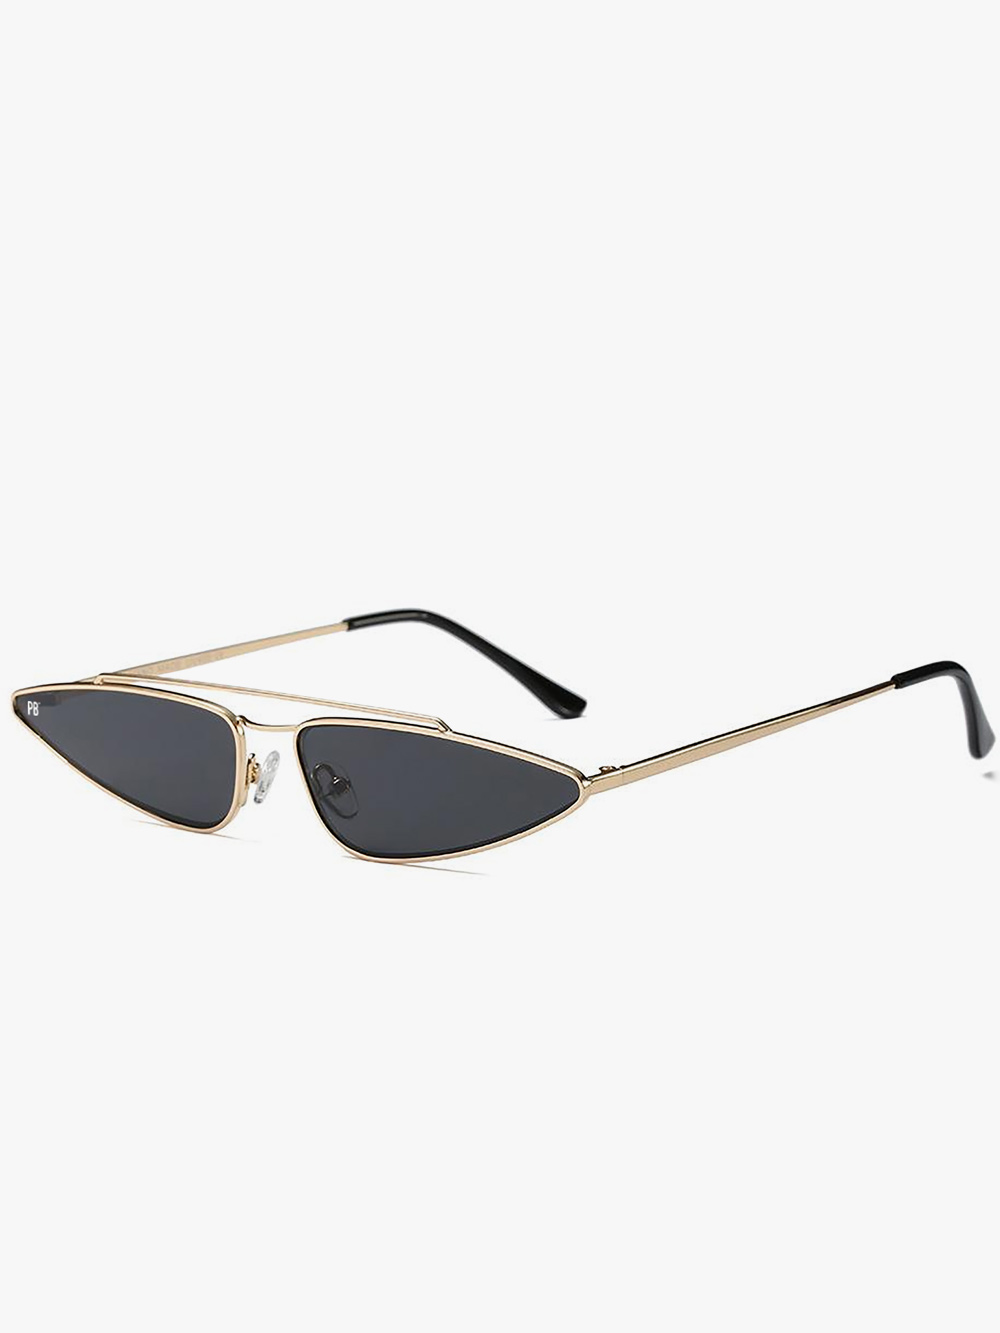 ivy-gold-black-pillenbrillen